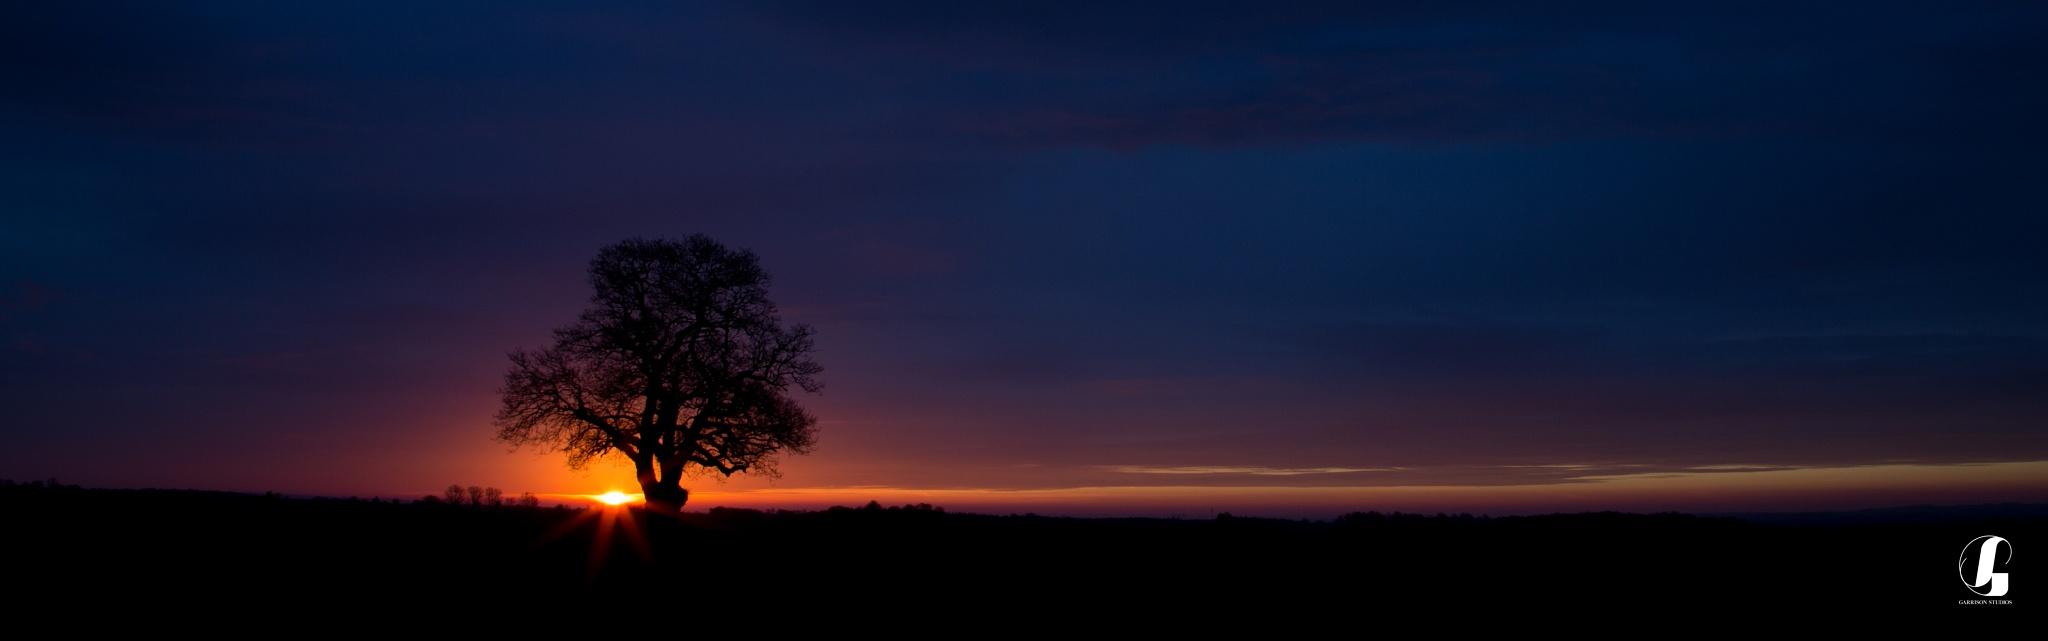 Sunrise Oak by Steve H